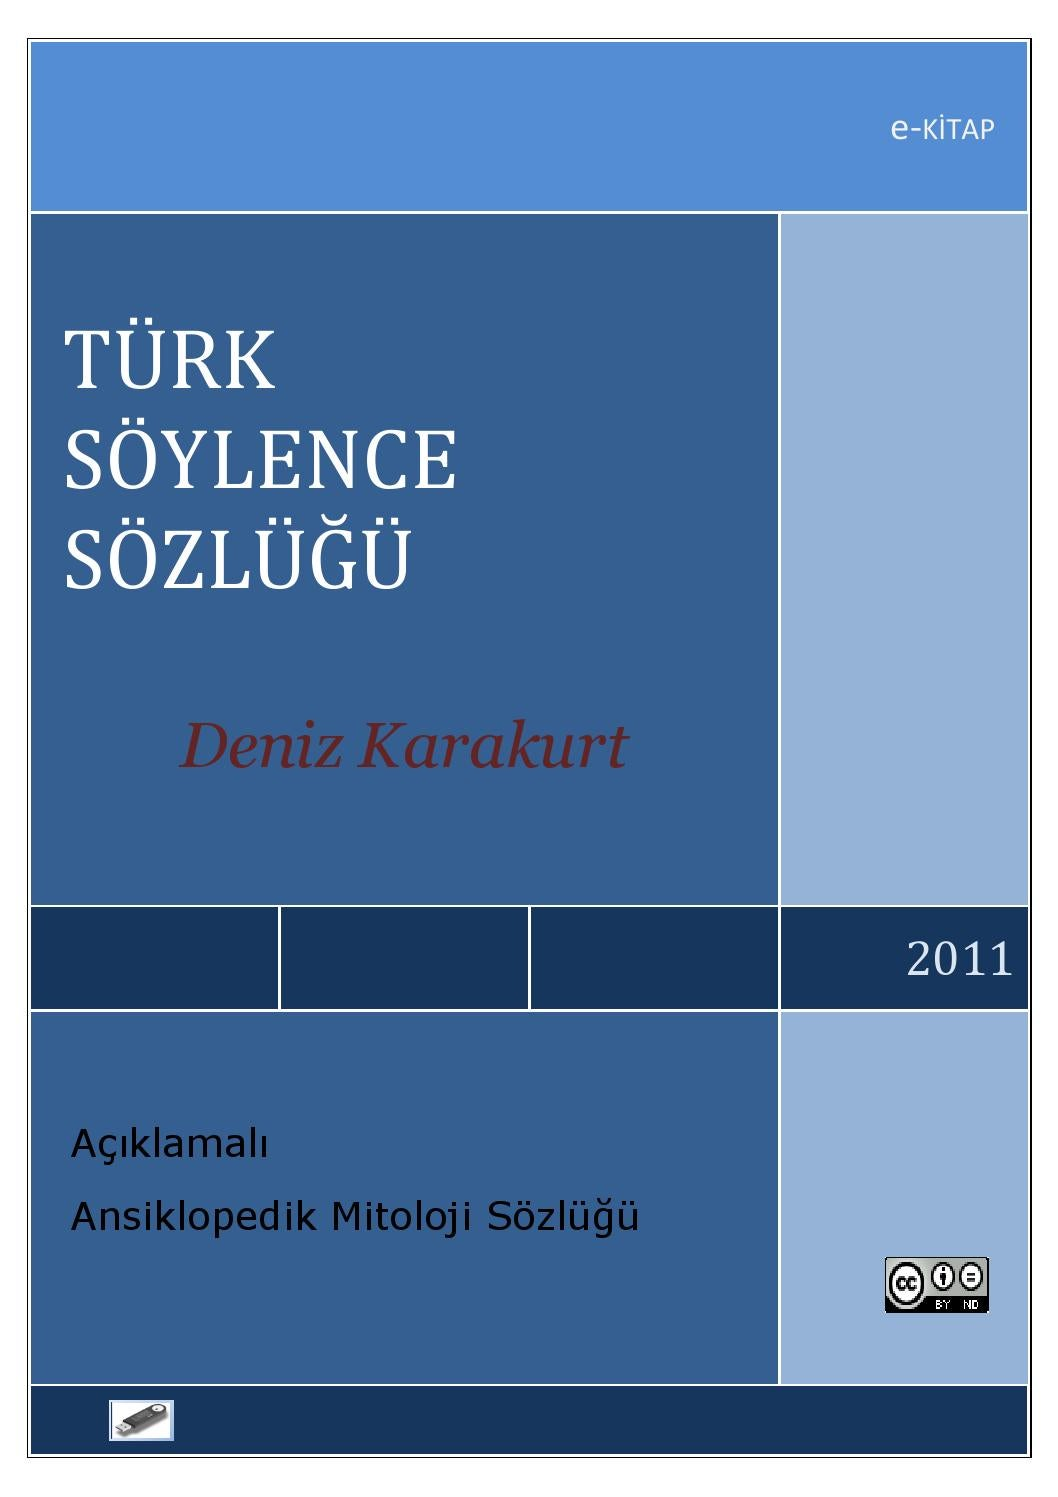 Turk Soylence Sozlugu by Edebiyat Kitap - issuu